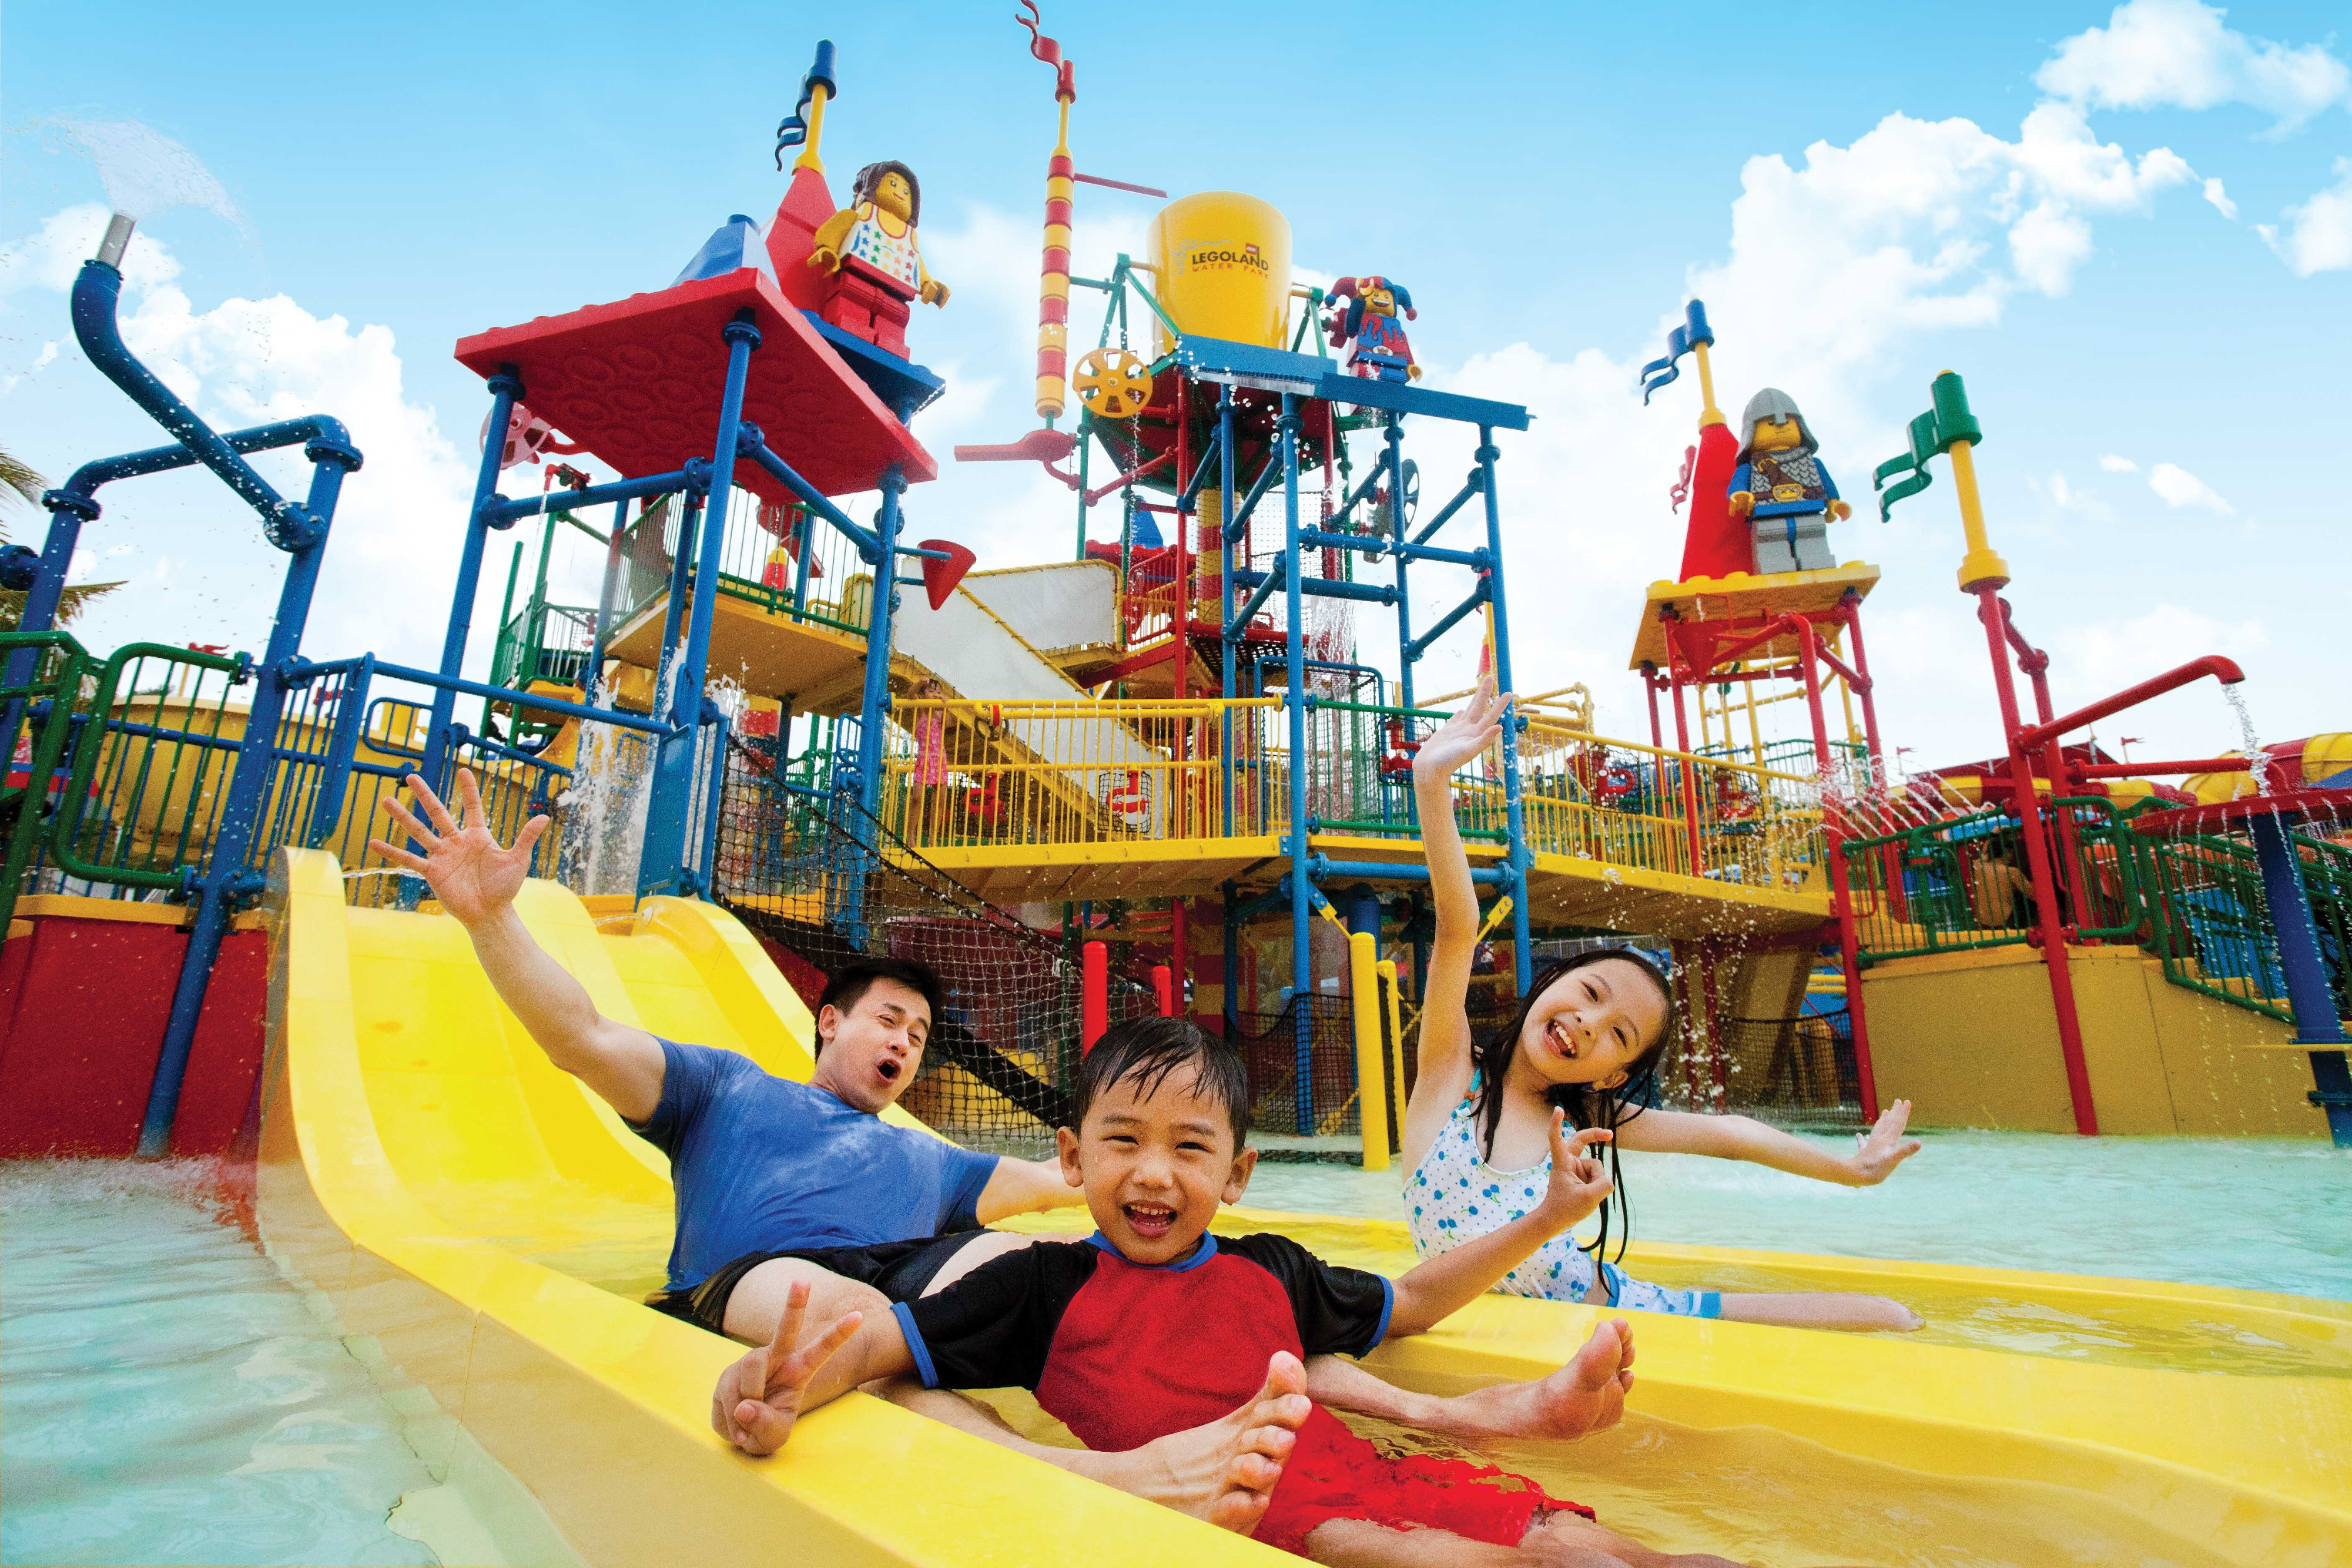 Legoland Malaysia Waterpark in Johor - Suma - Explore Asia